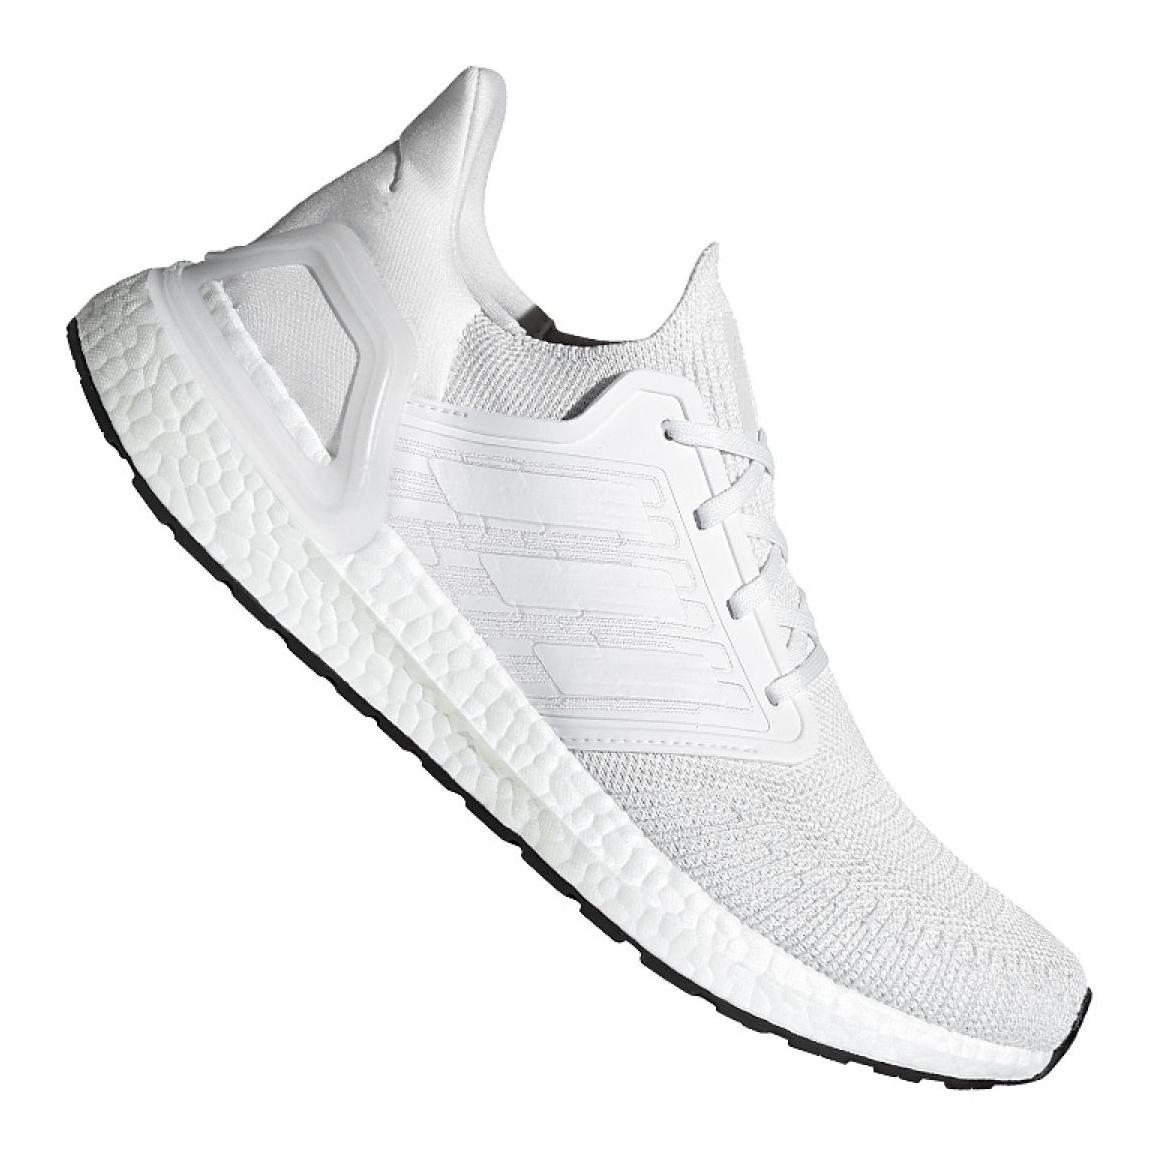 Sapatos Adidas UltraBoost 20 M EF1042 branco